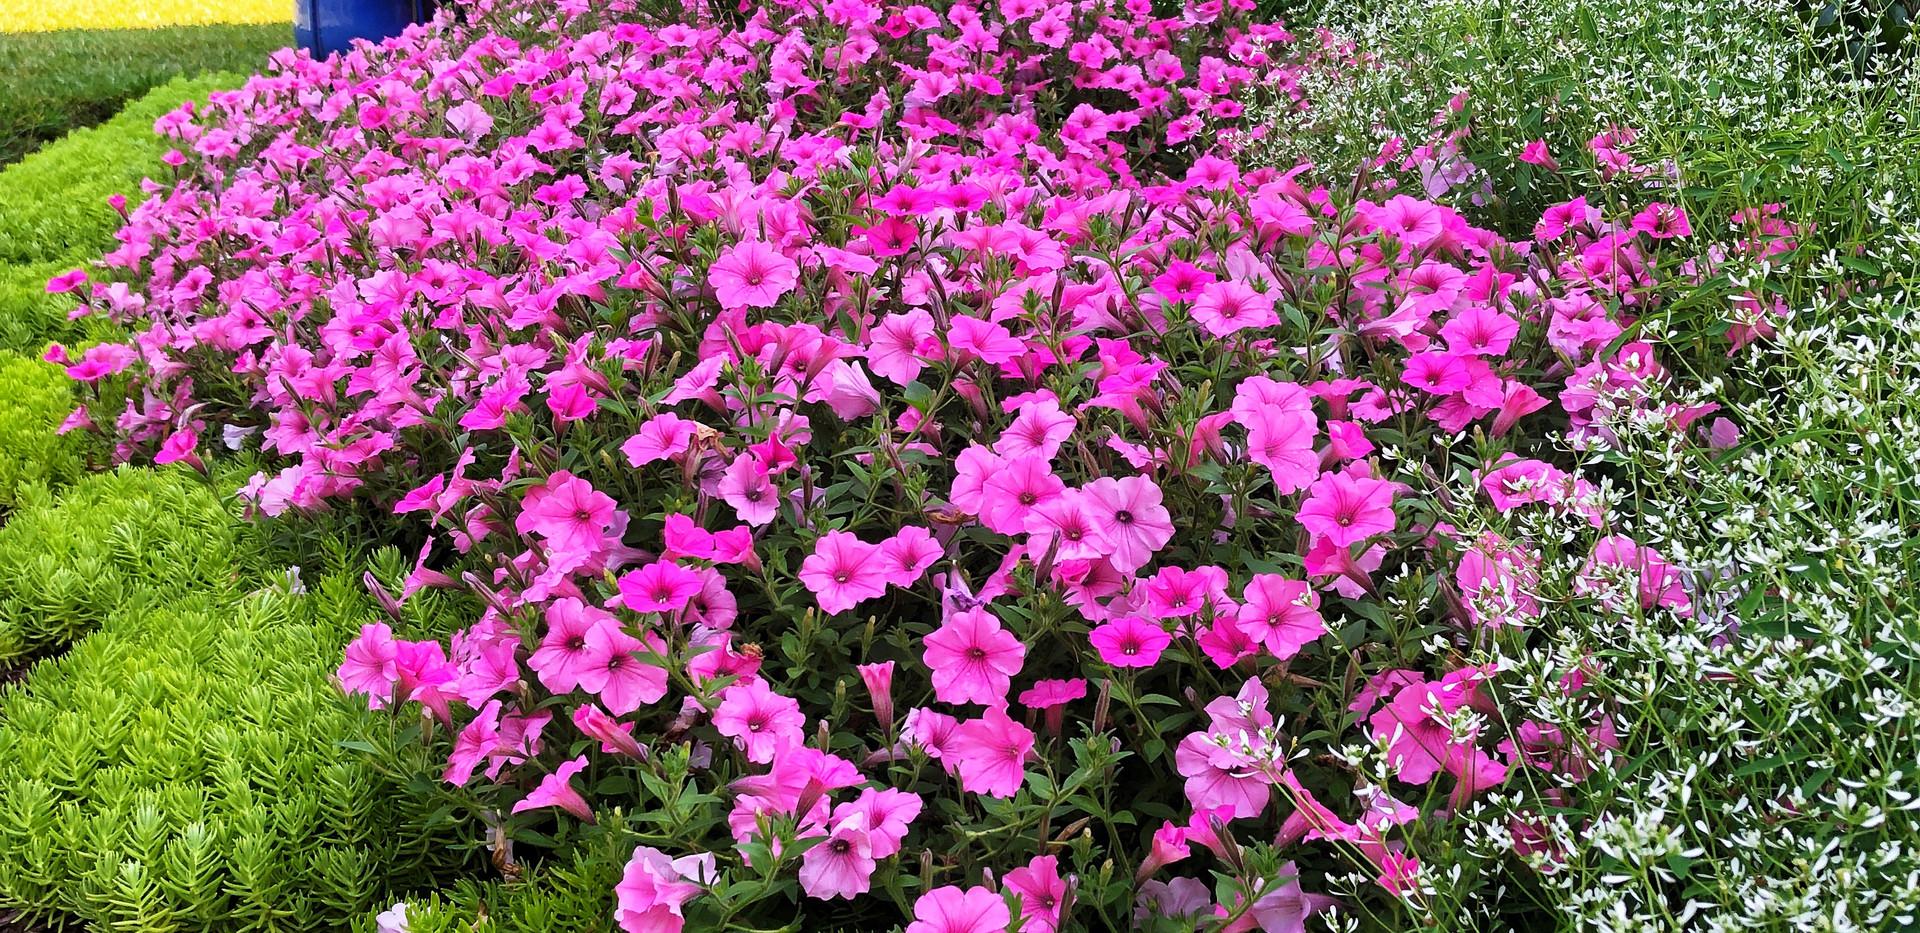 Endless Blooms